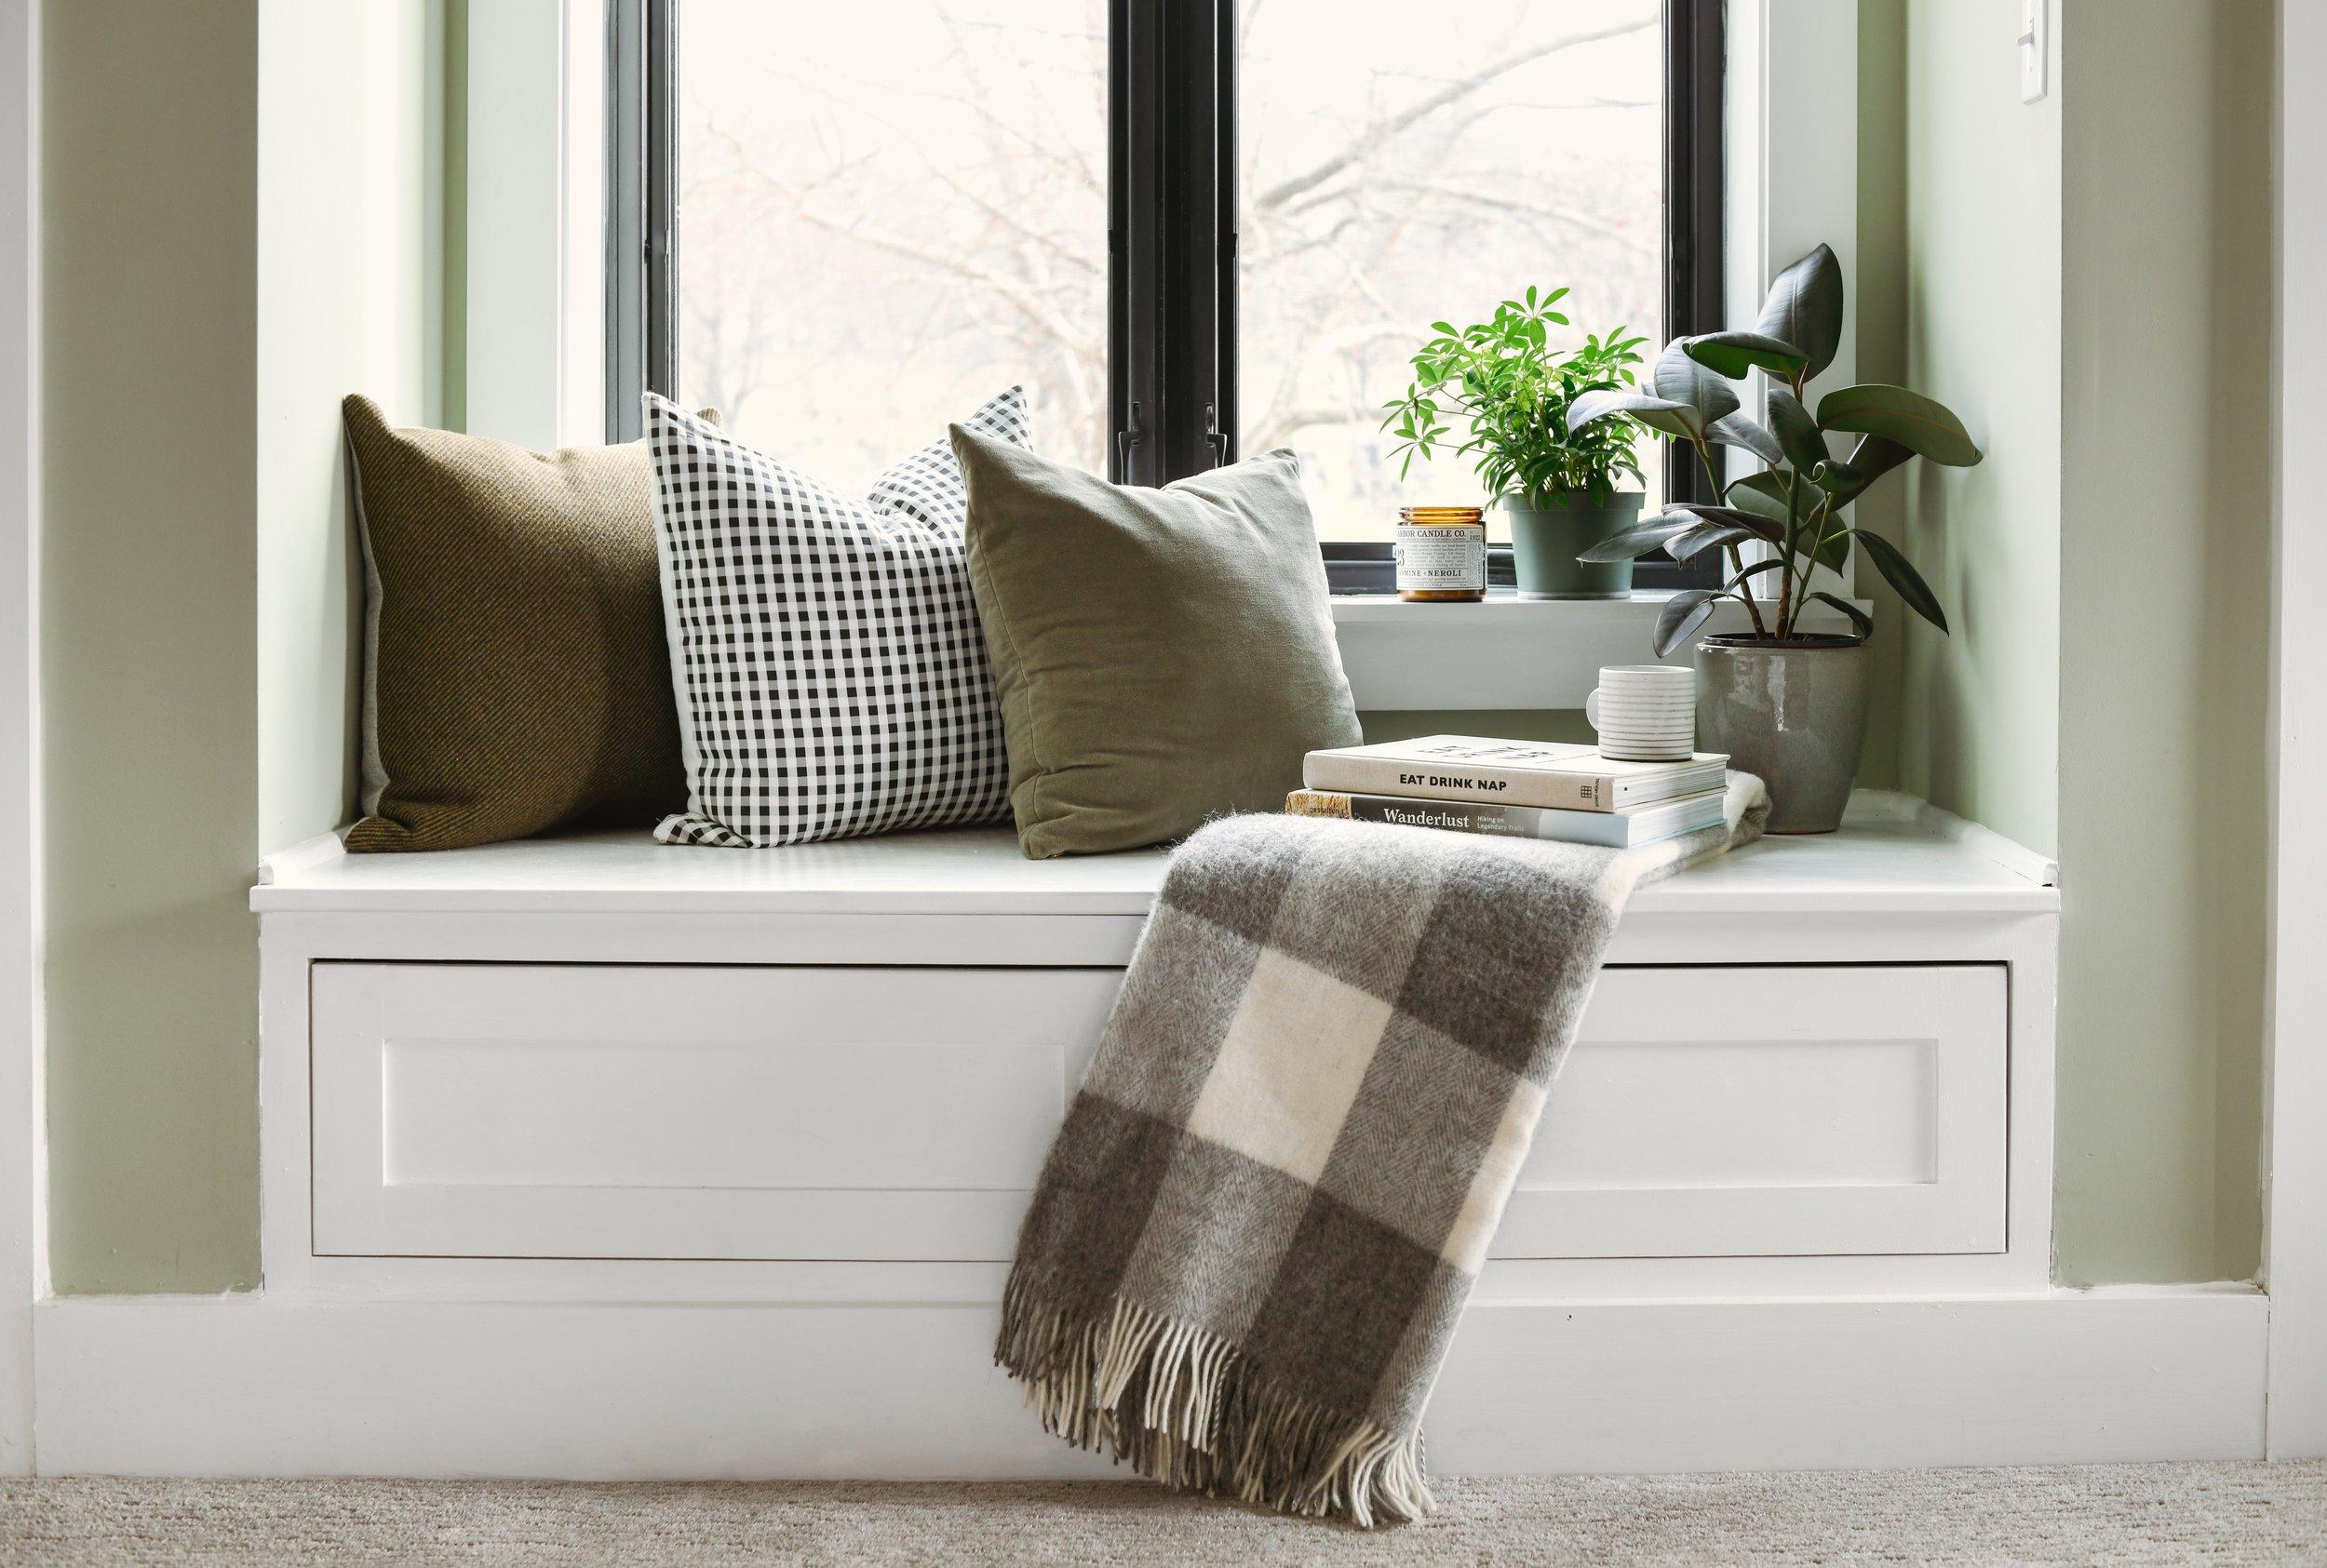 Katy Popple Design - Master Bedroom Bench 2.jpeg